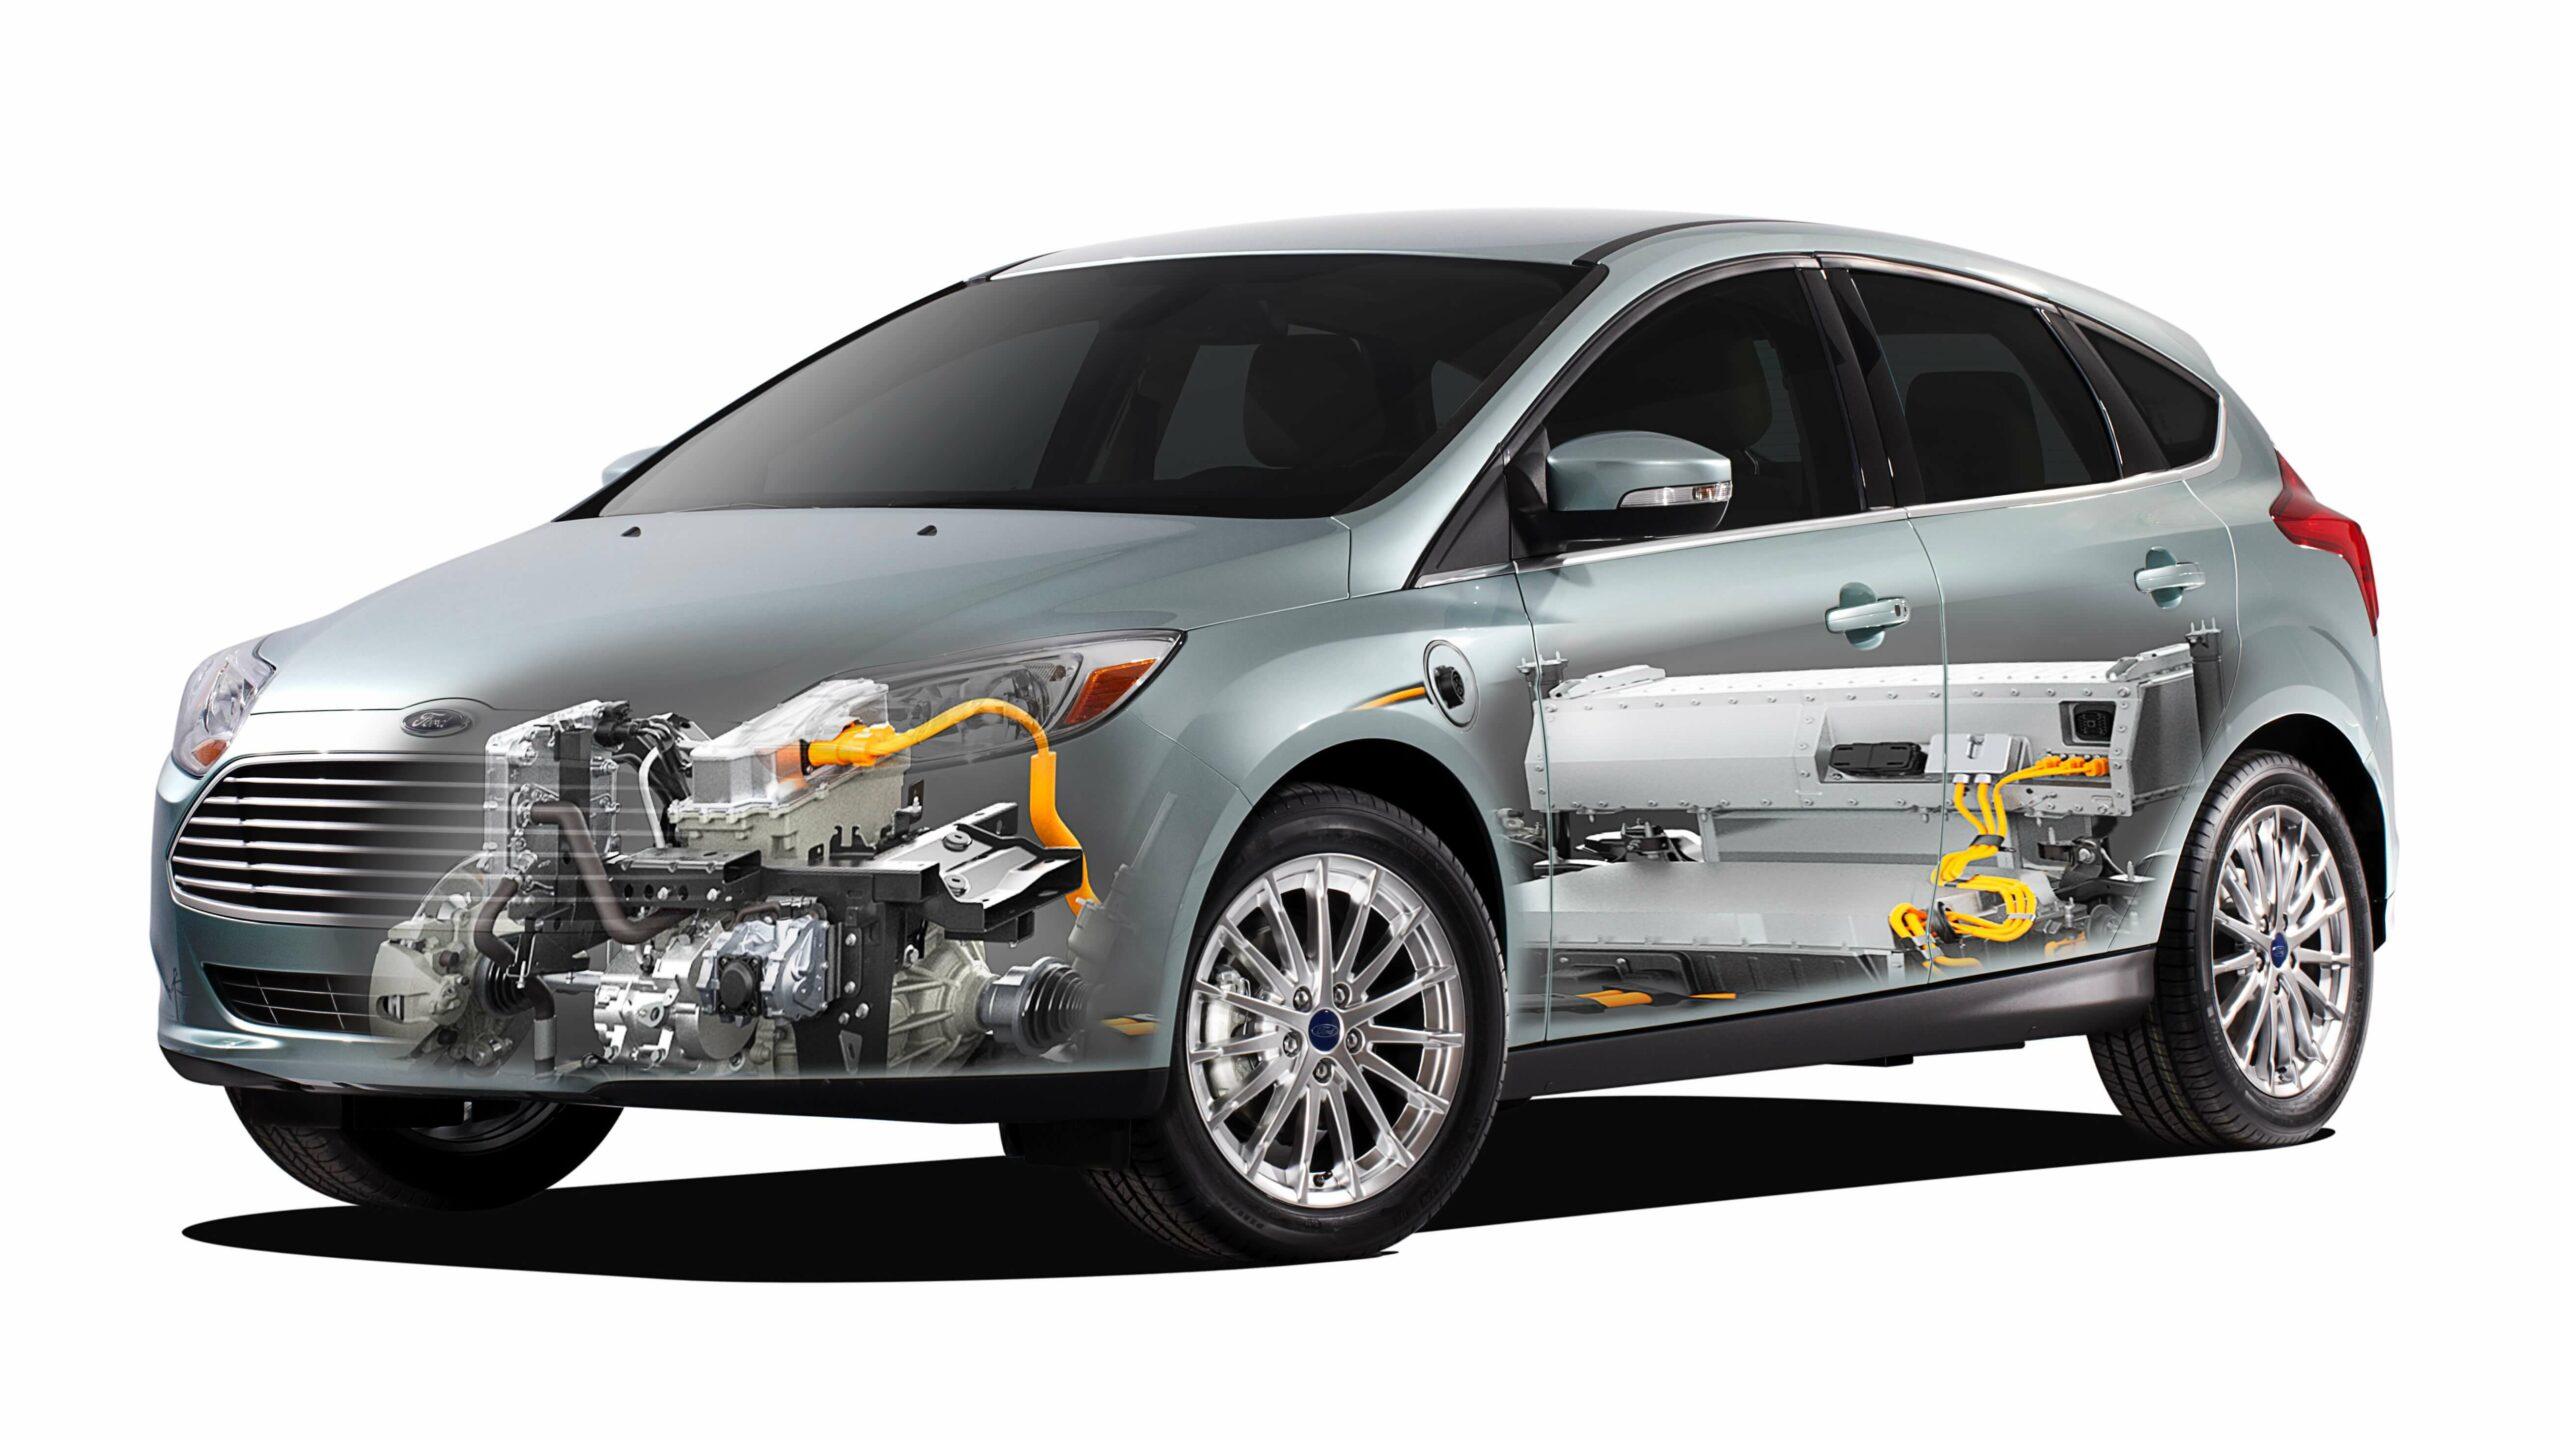 Ford Focus Electric aandrijving